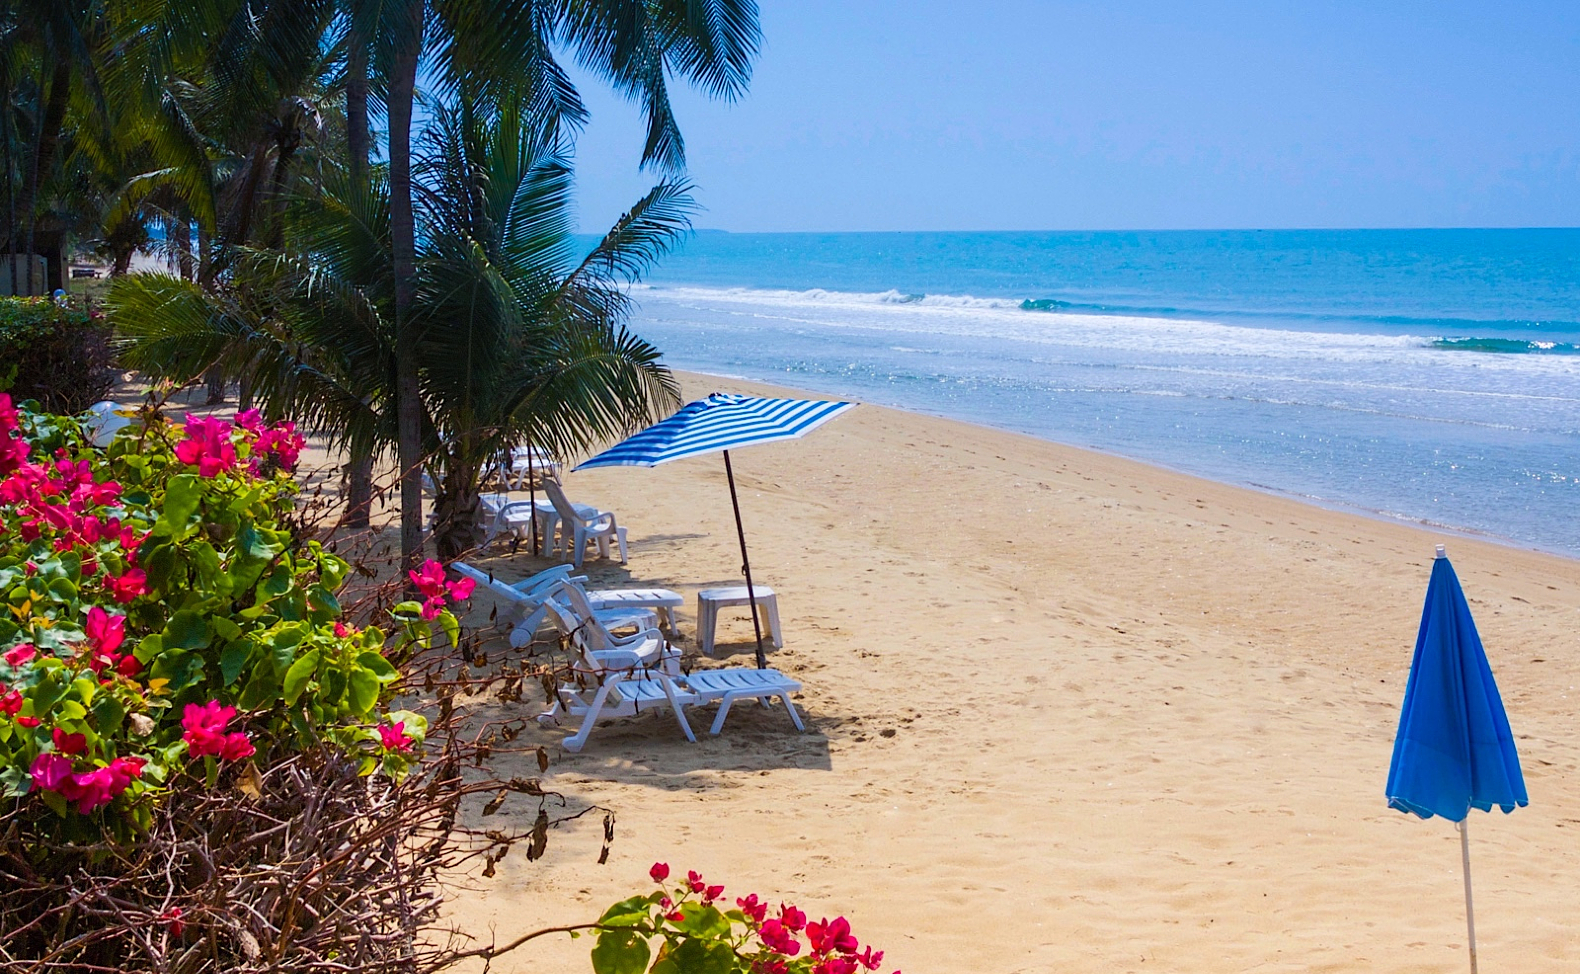 Natural-Villas-Front-Samet-Beach-House-Book-Now-TABLET-Header-Image